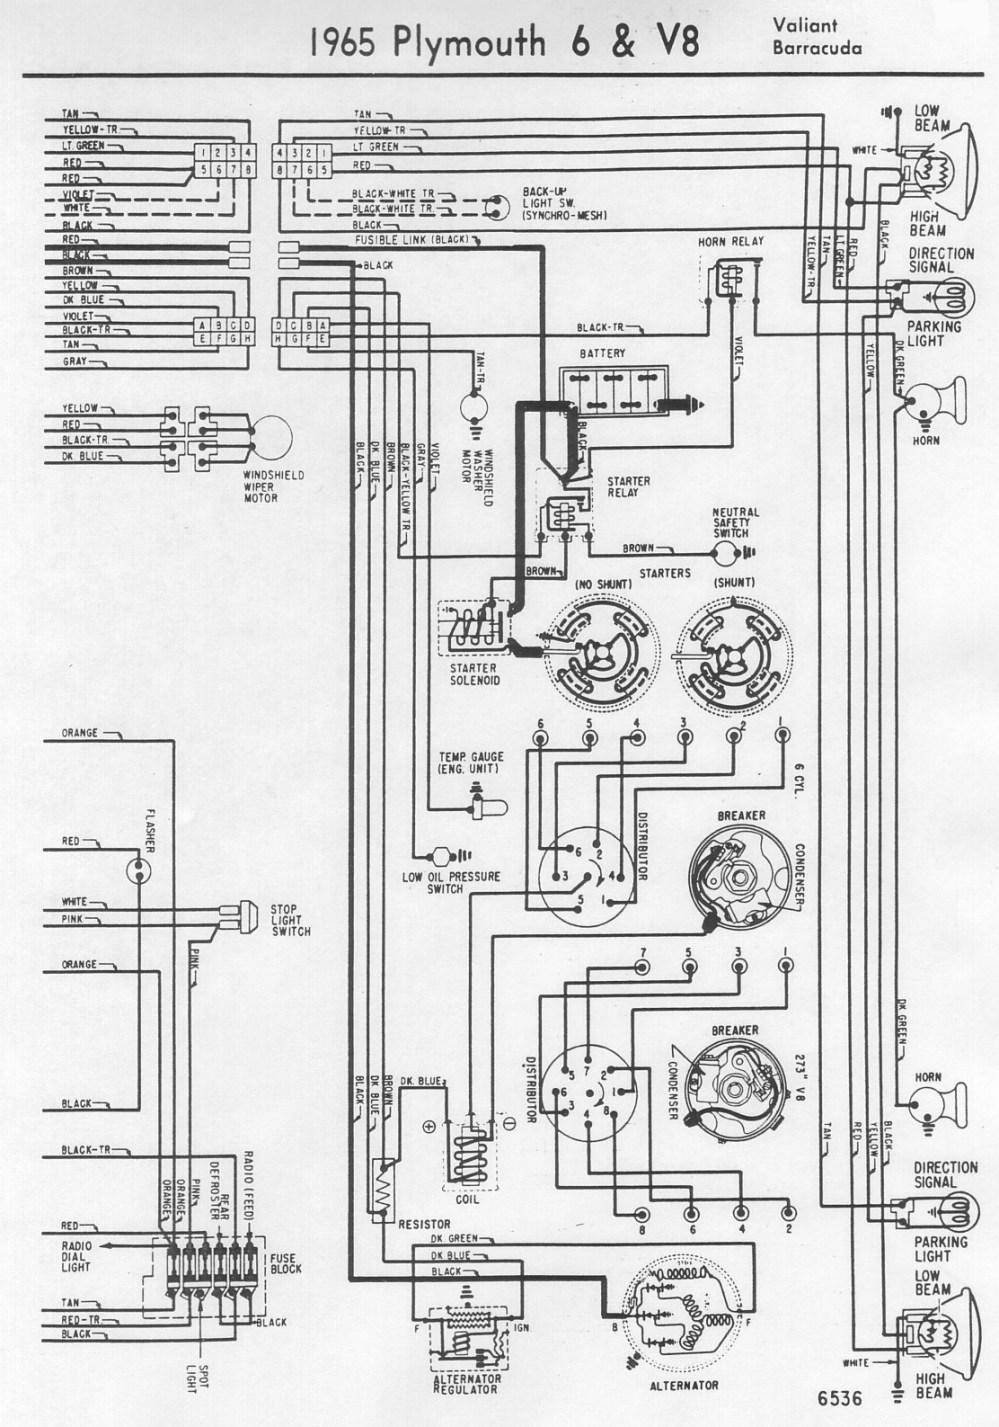 medium resolution of 1972 cuda wiper diagram trusted wiring diagram windshield wiper motor wiring diagram 1972 cuda wiper diagram wiring schematic